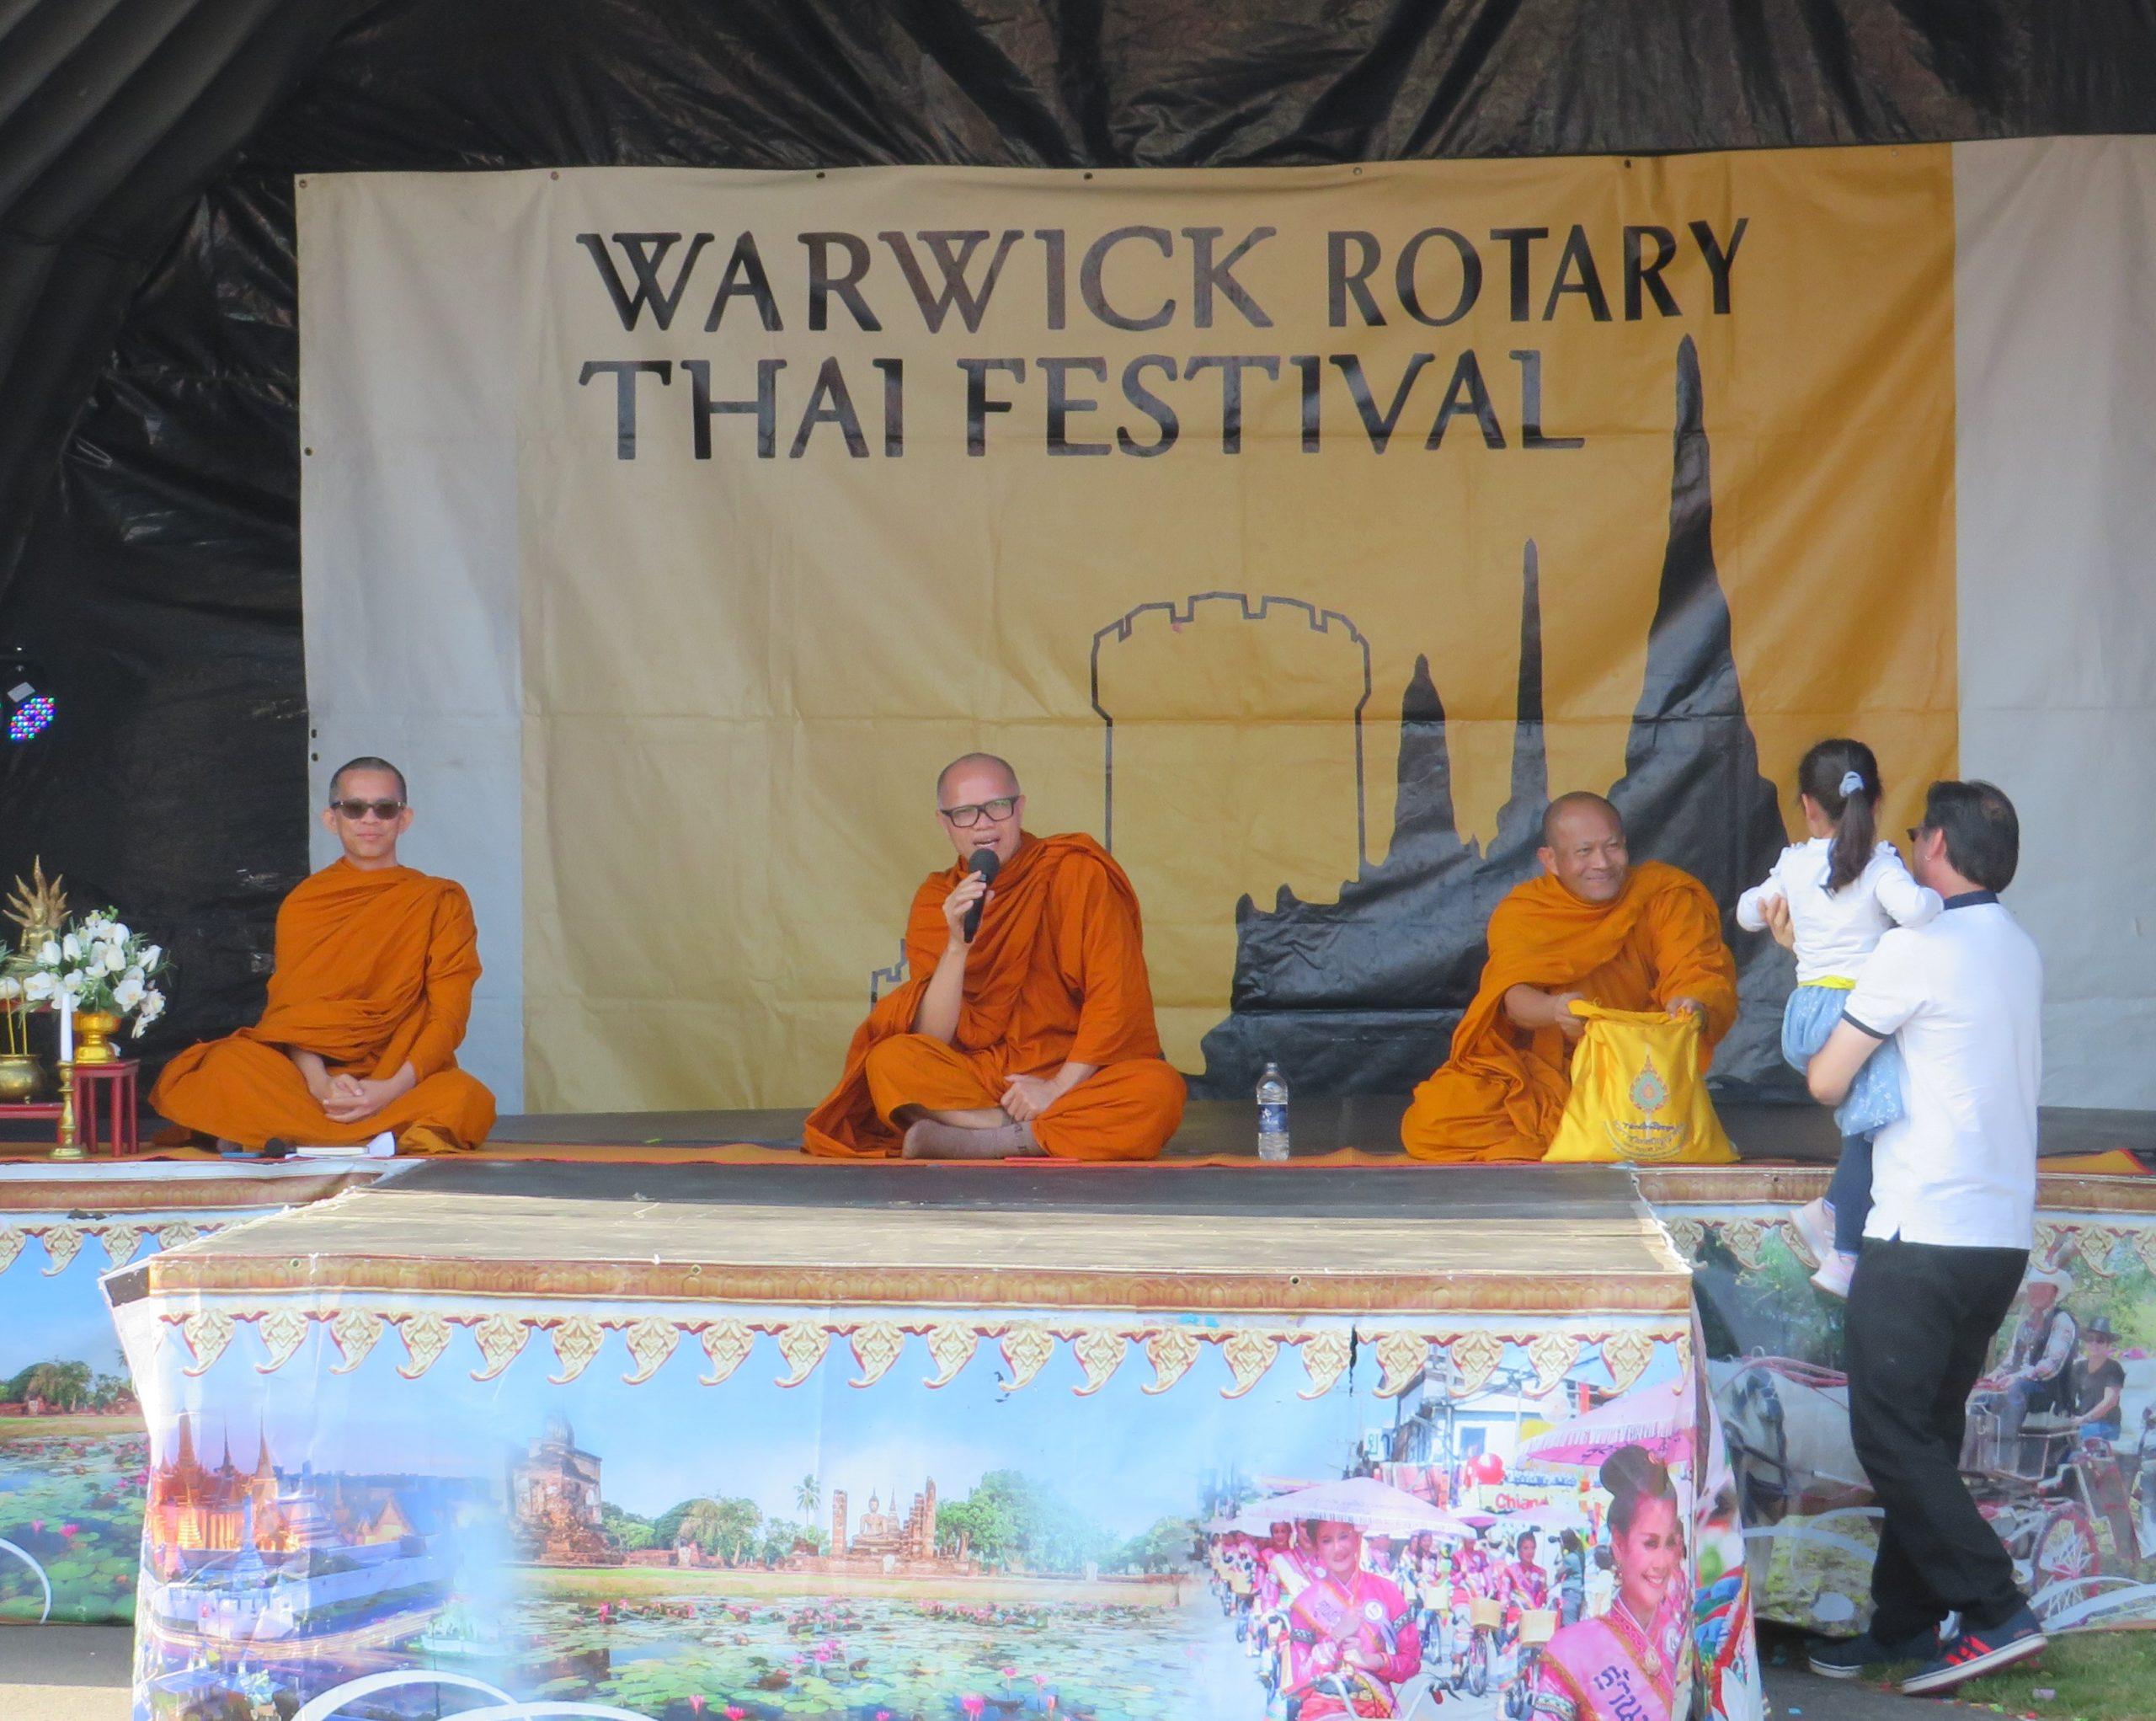 Warwick Thai Festival, Rotary Club